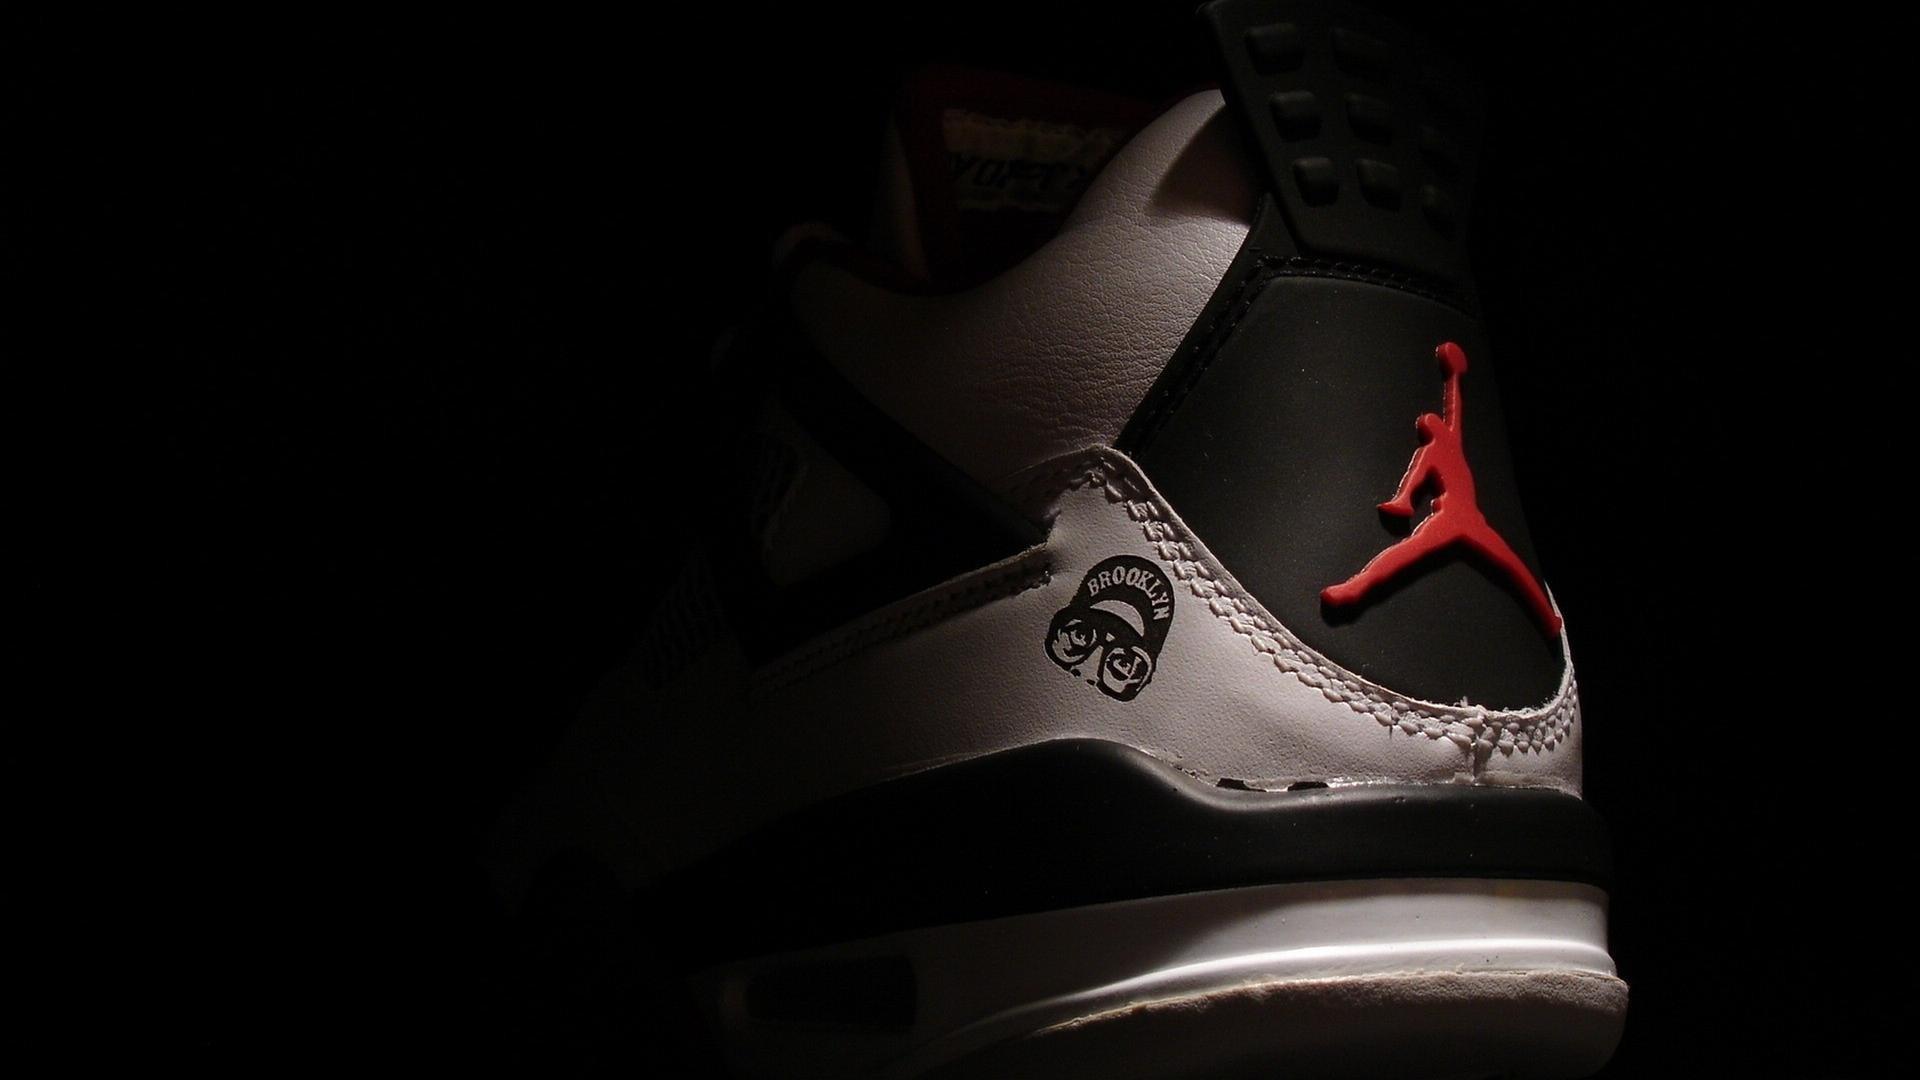 Res: 1920x1080, Air Jordan Shoes Wallpapers - Wallpaper Cave